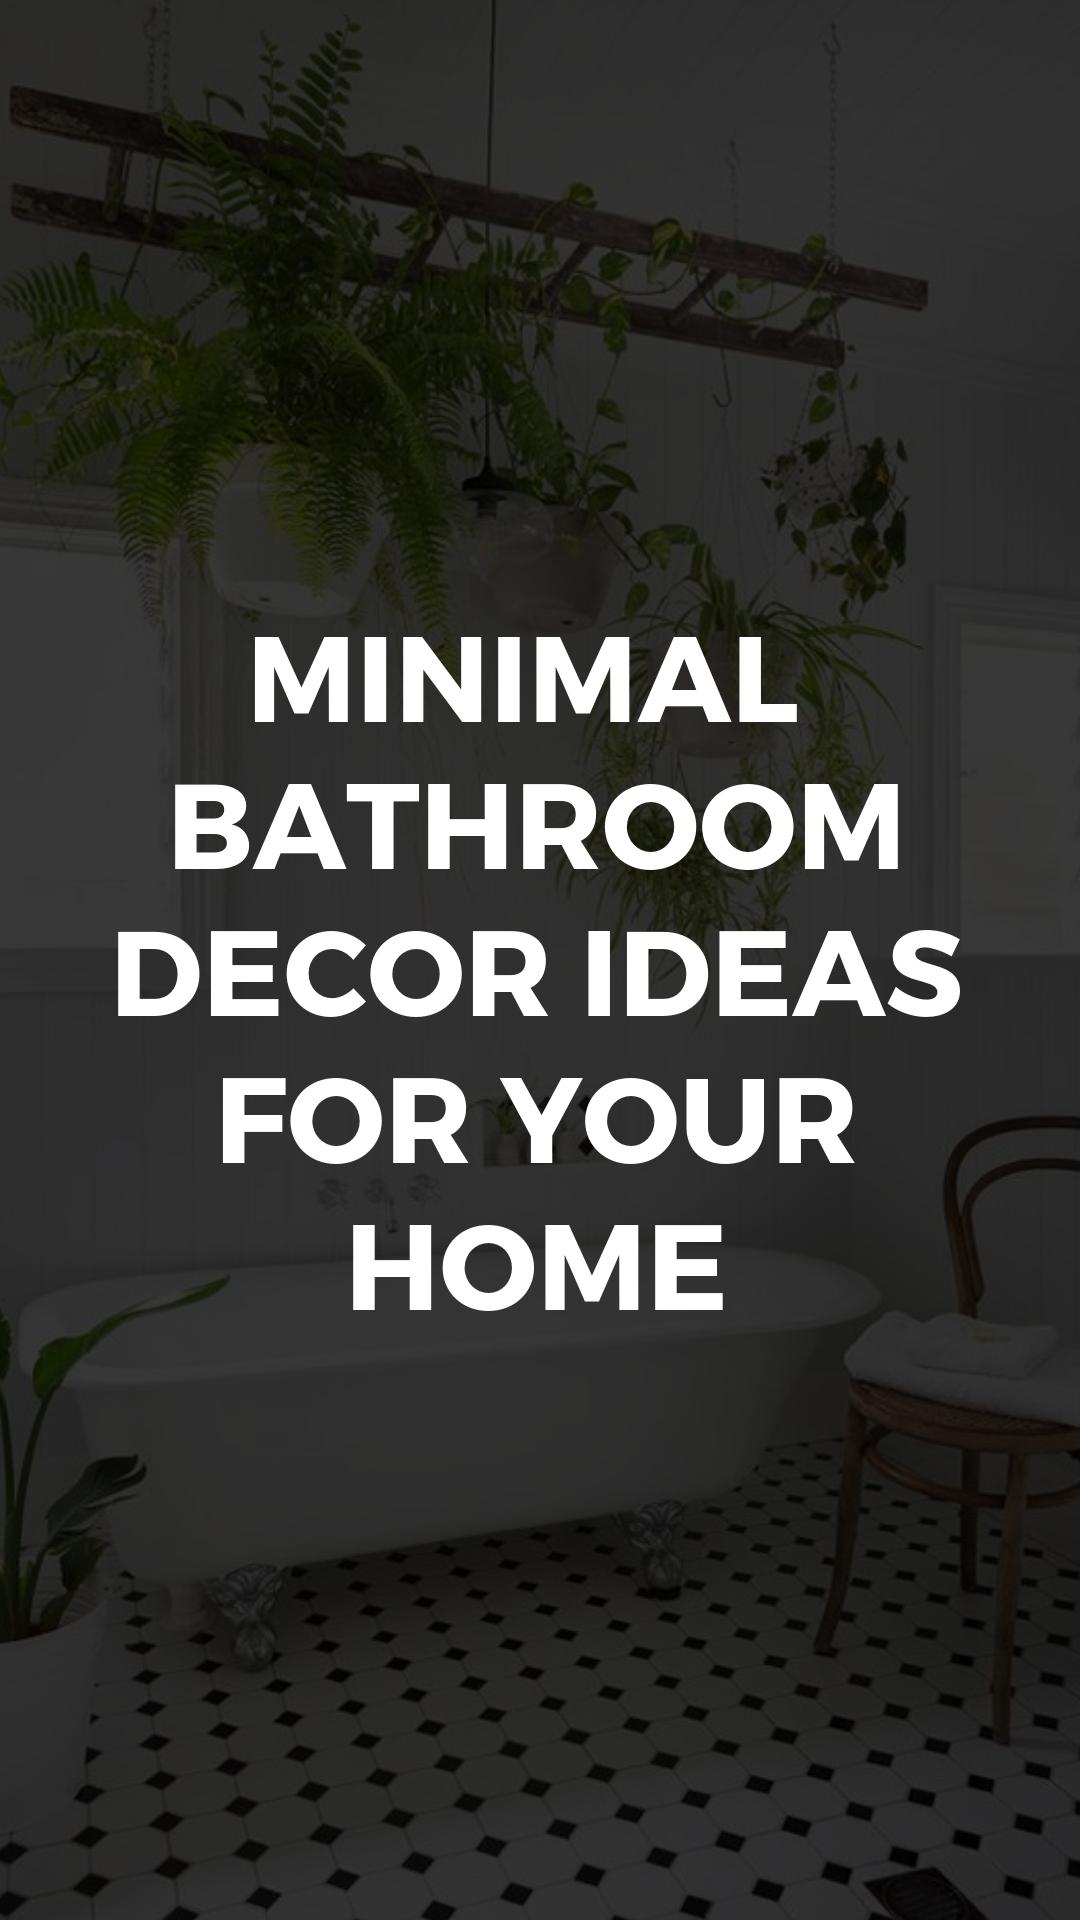 Minimal bathroom decor tips 1.jpg